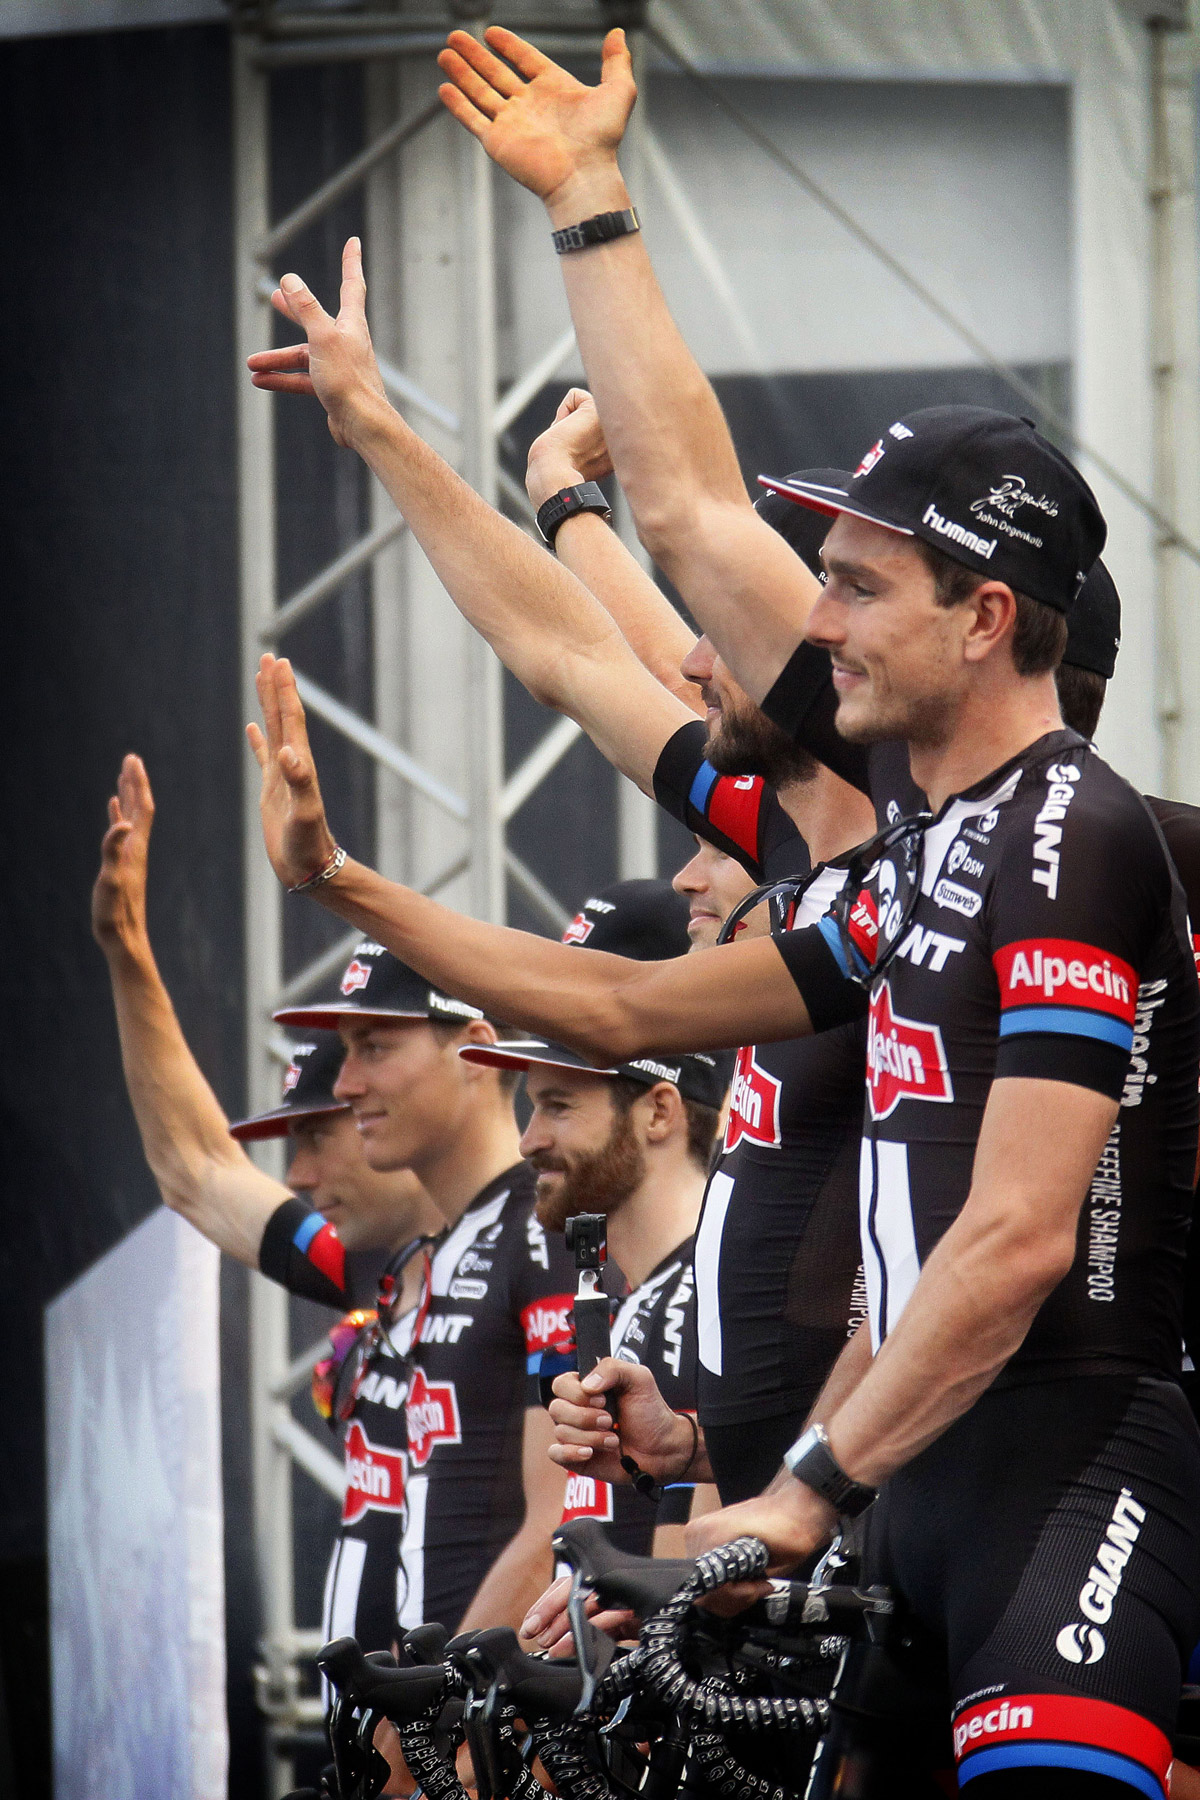 Team Giant-Alpecin (Foto: Roth&Roth roth-foto.de)